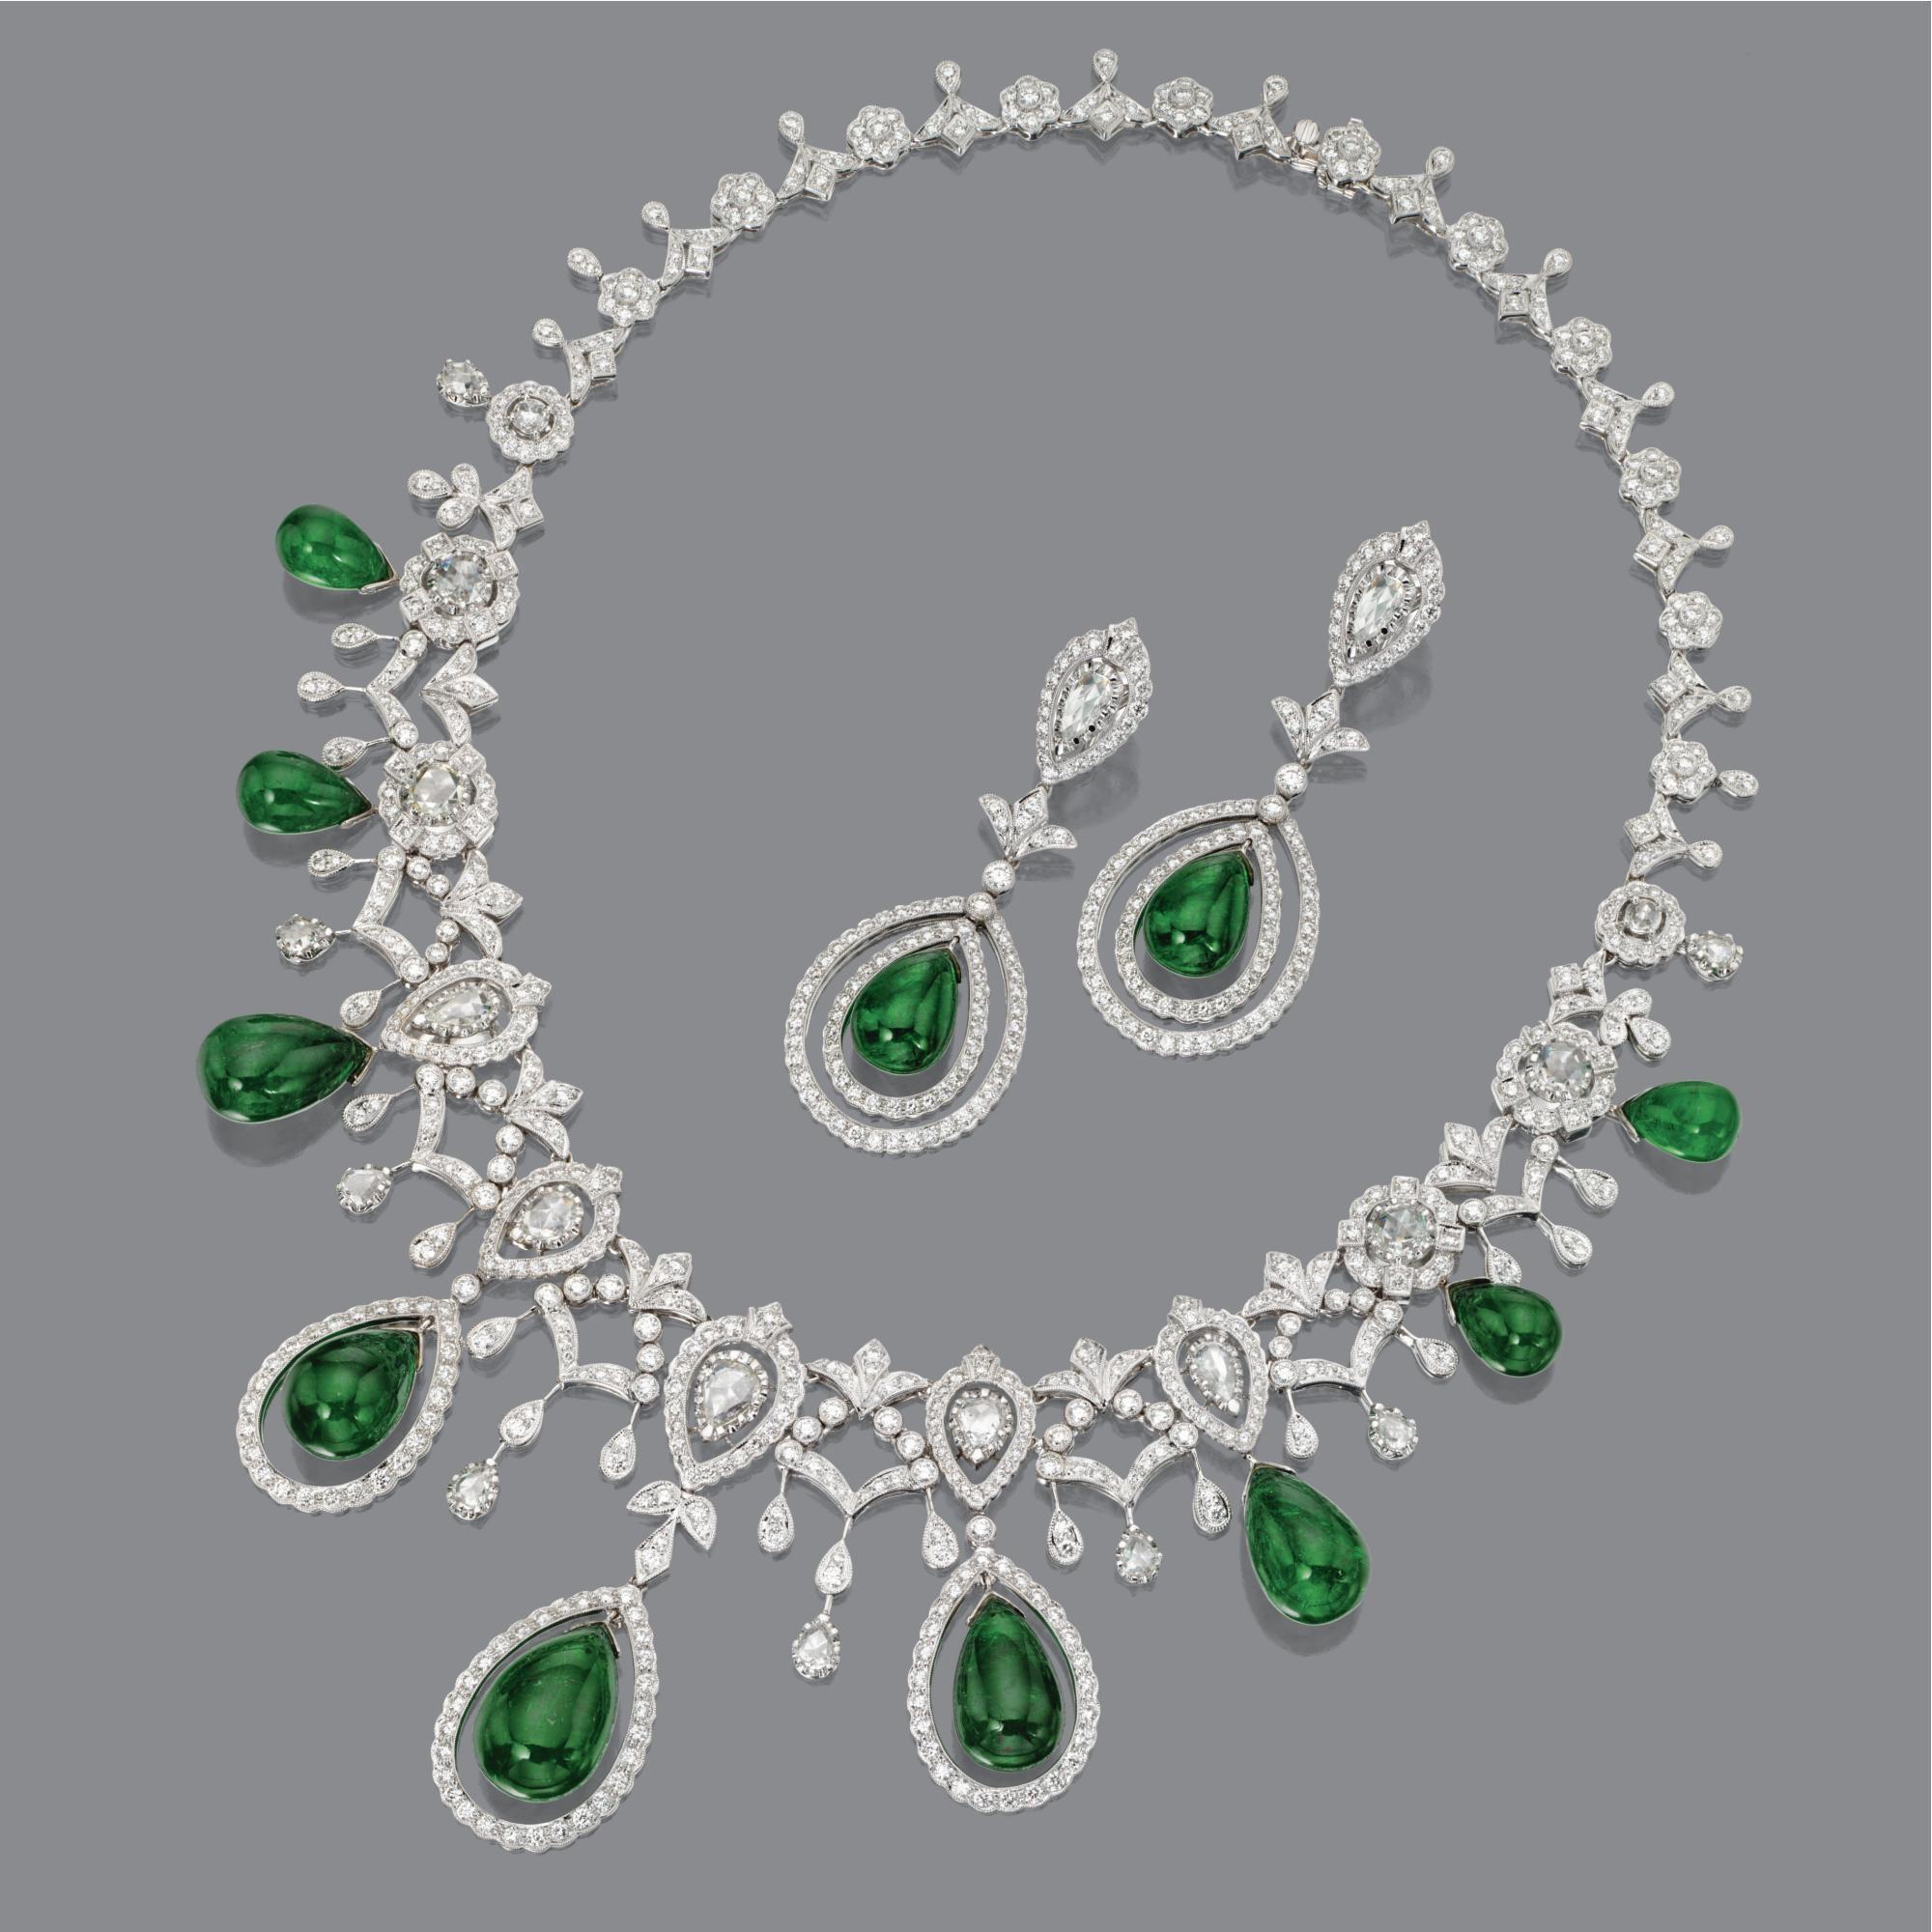 Emerald Diamond Jewellery: DIAMOND AND EMERALD NECKLACE AND EARRINGS Estimate 50,000